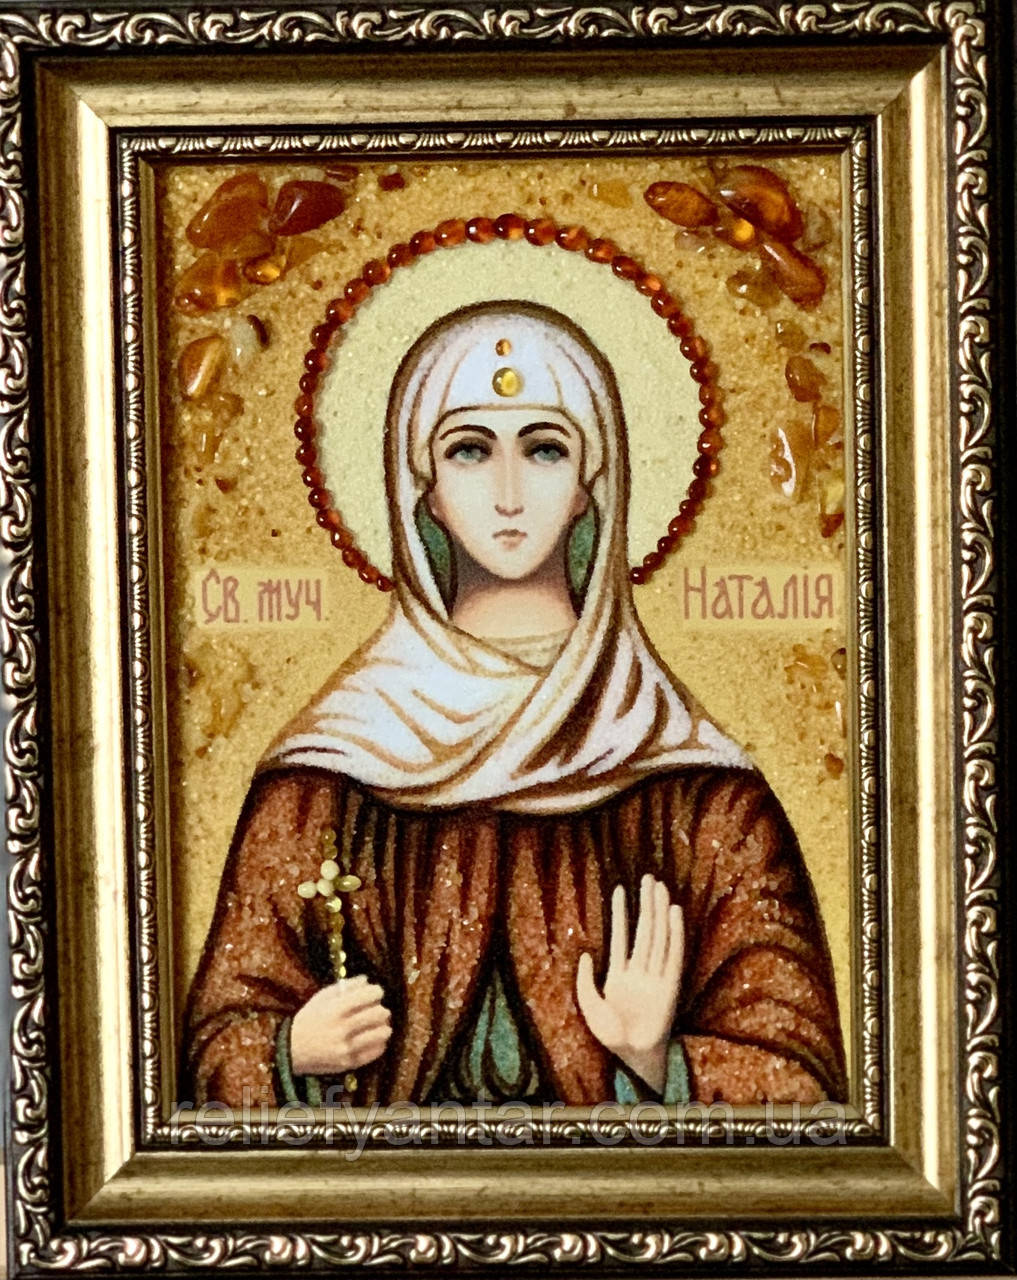 Икона из янтаря Наталия именная